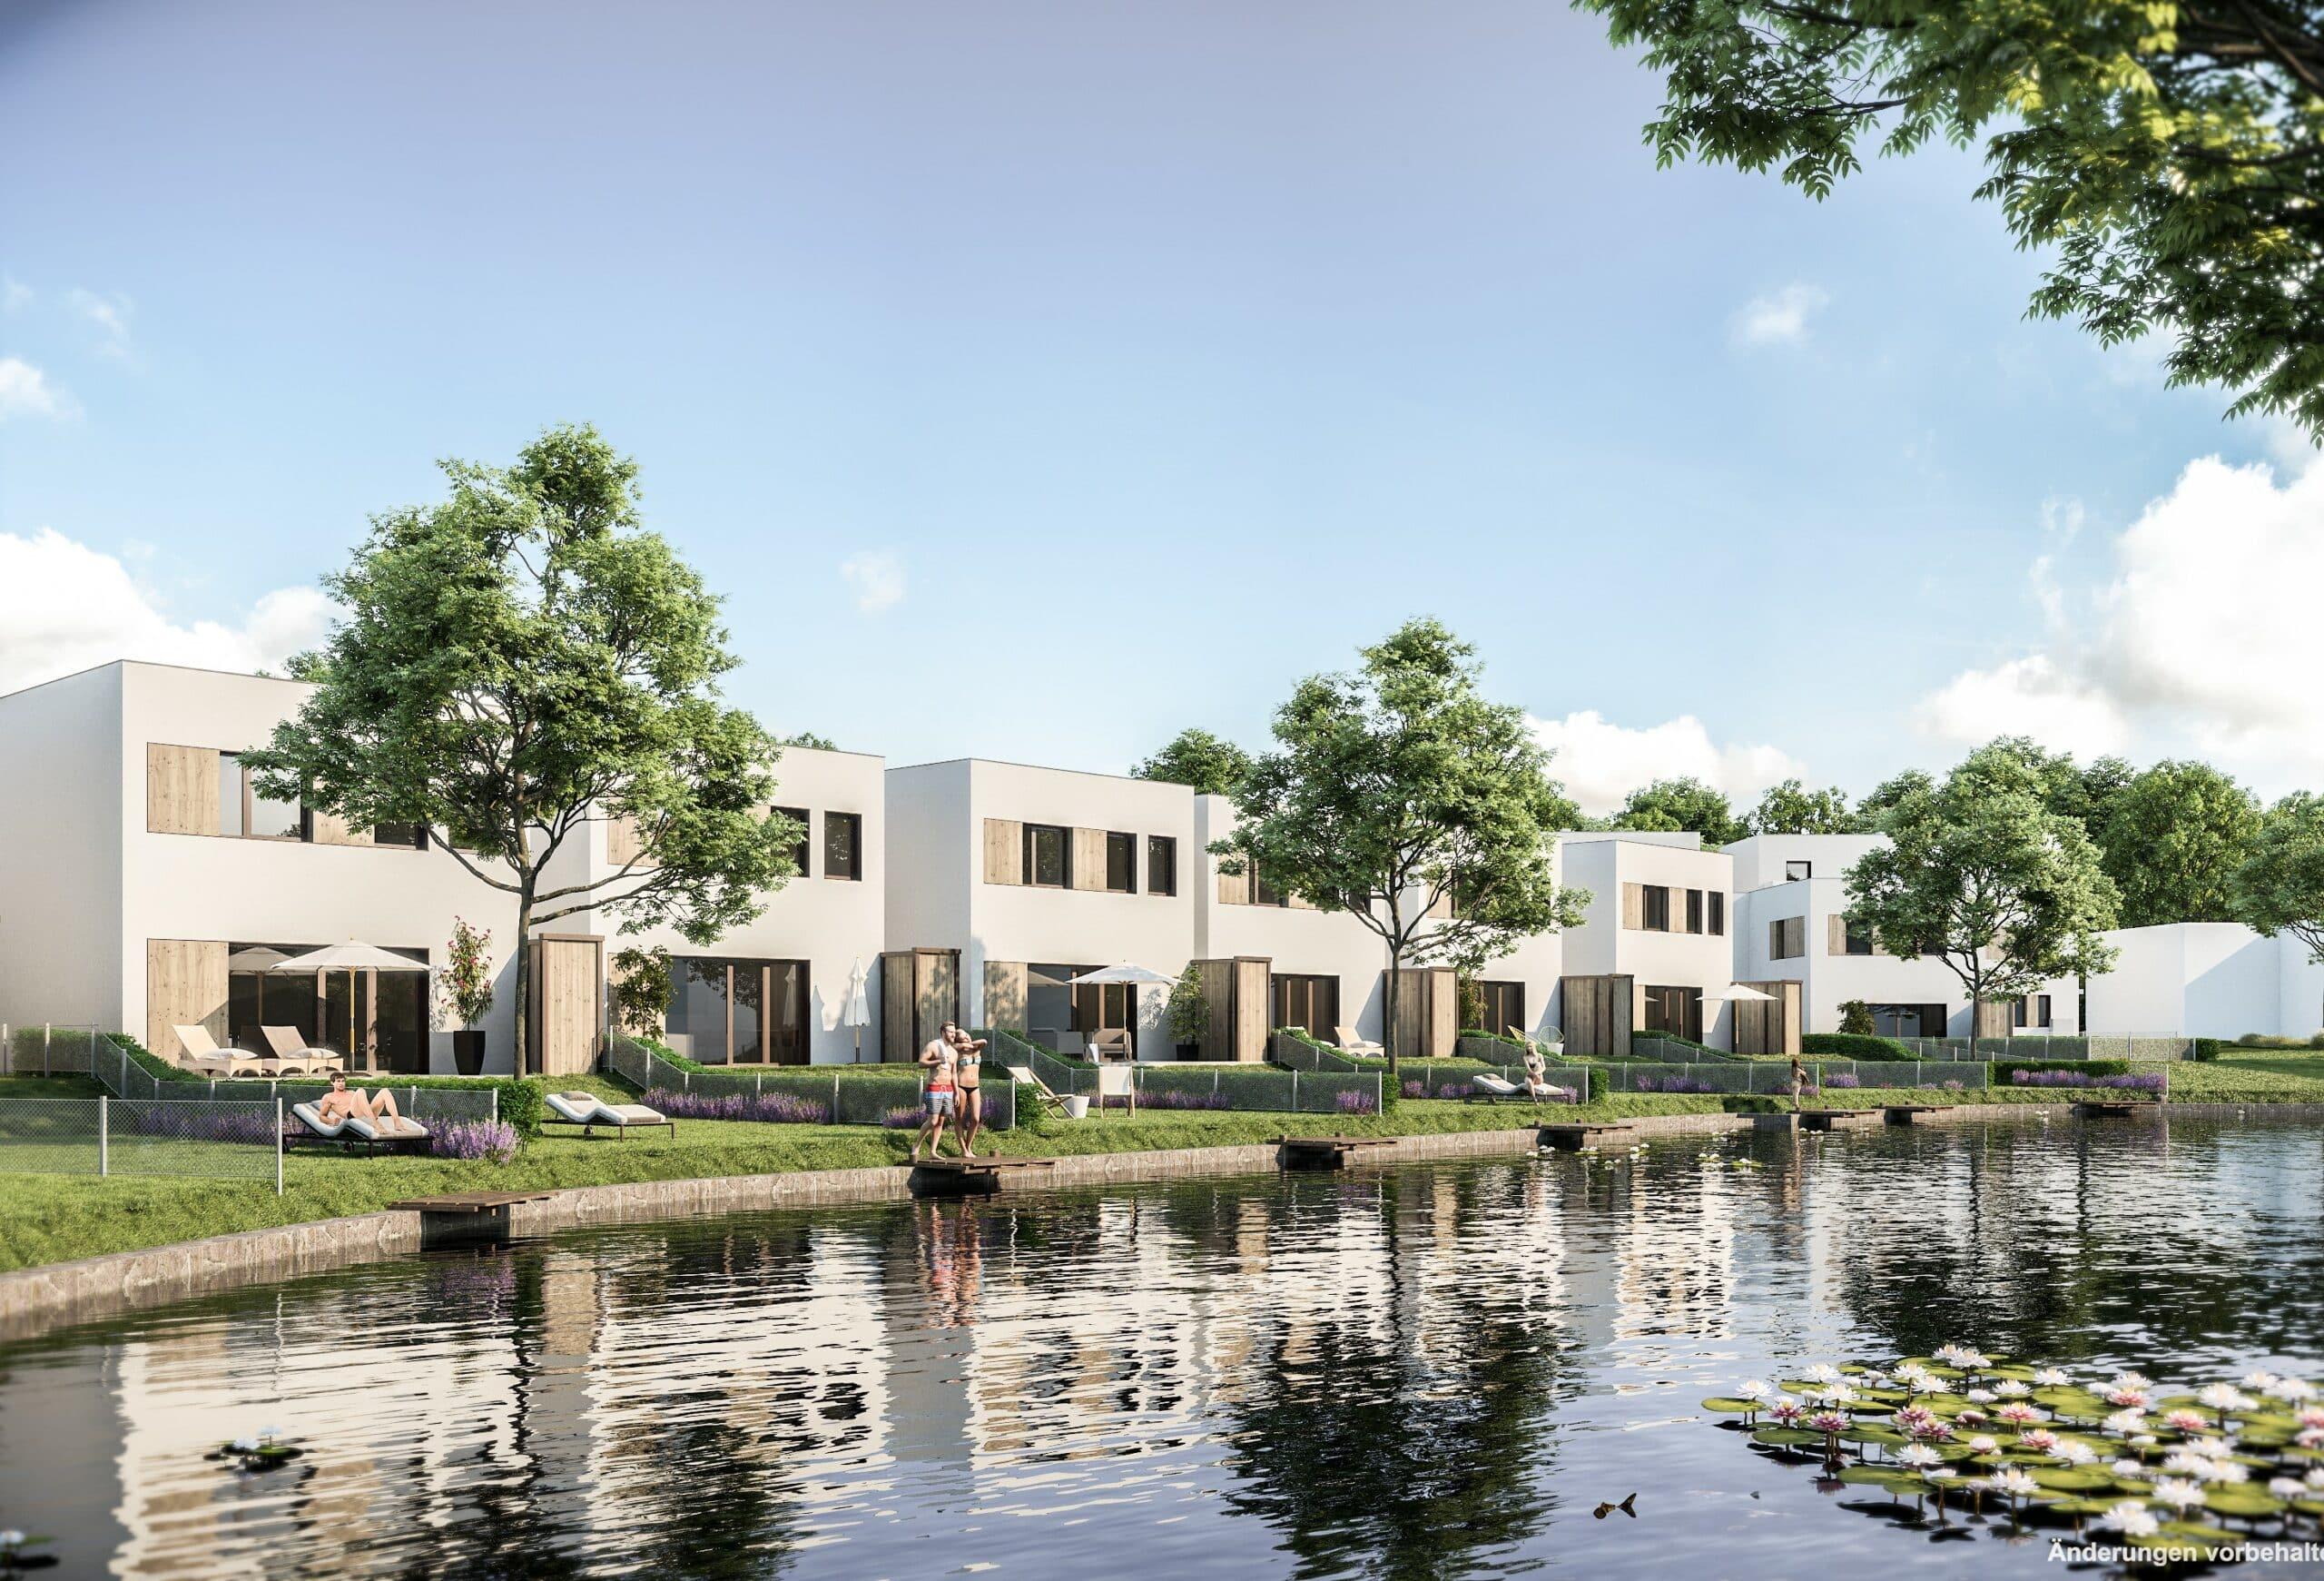 VI Engineers Immobilienprojekte im Wiener Umland